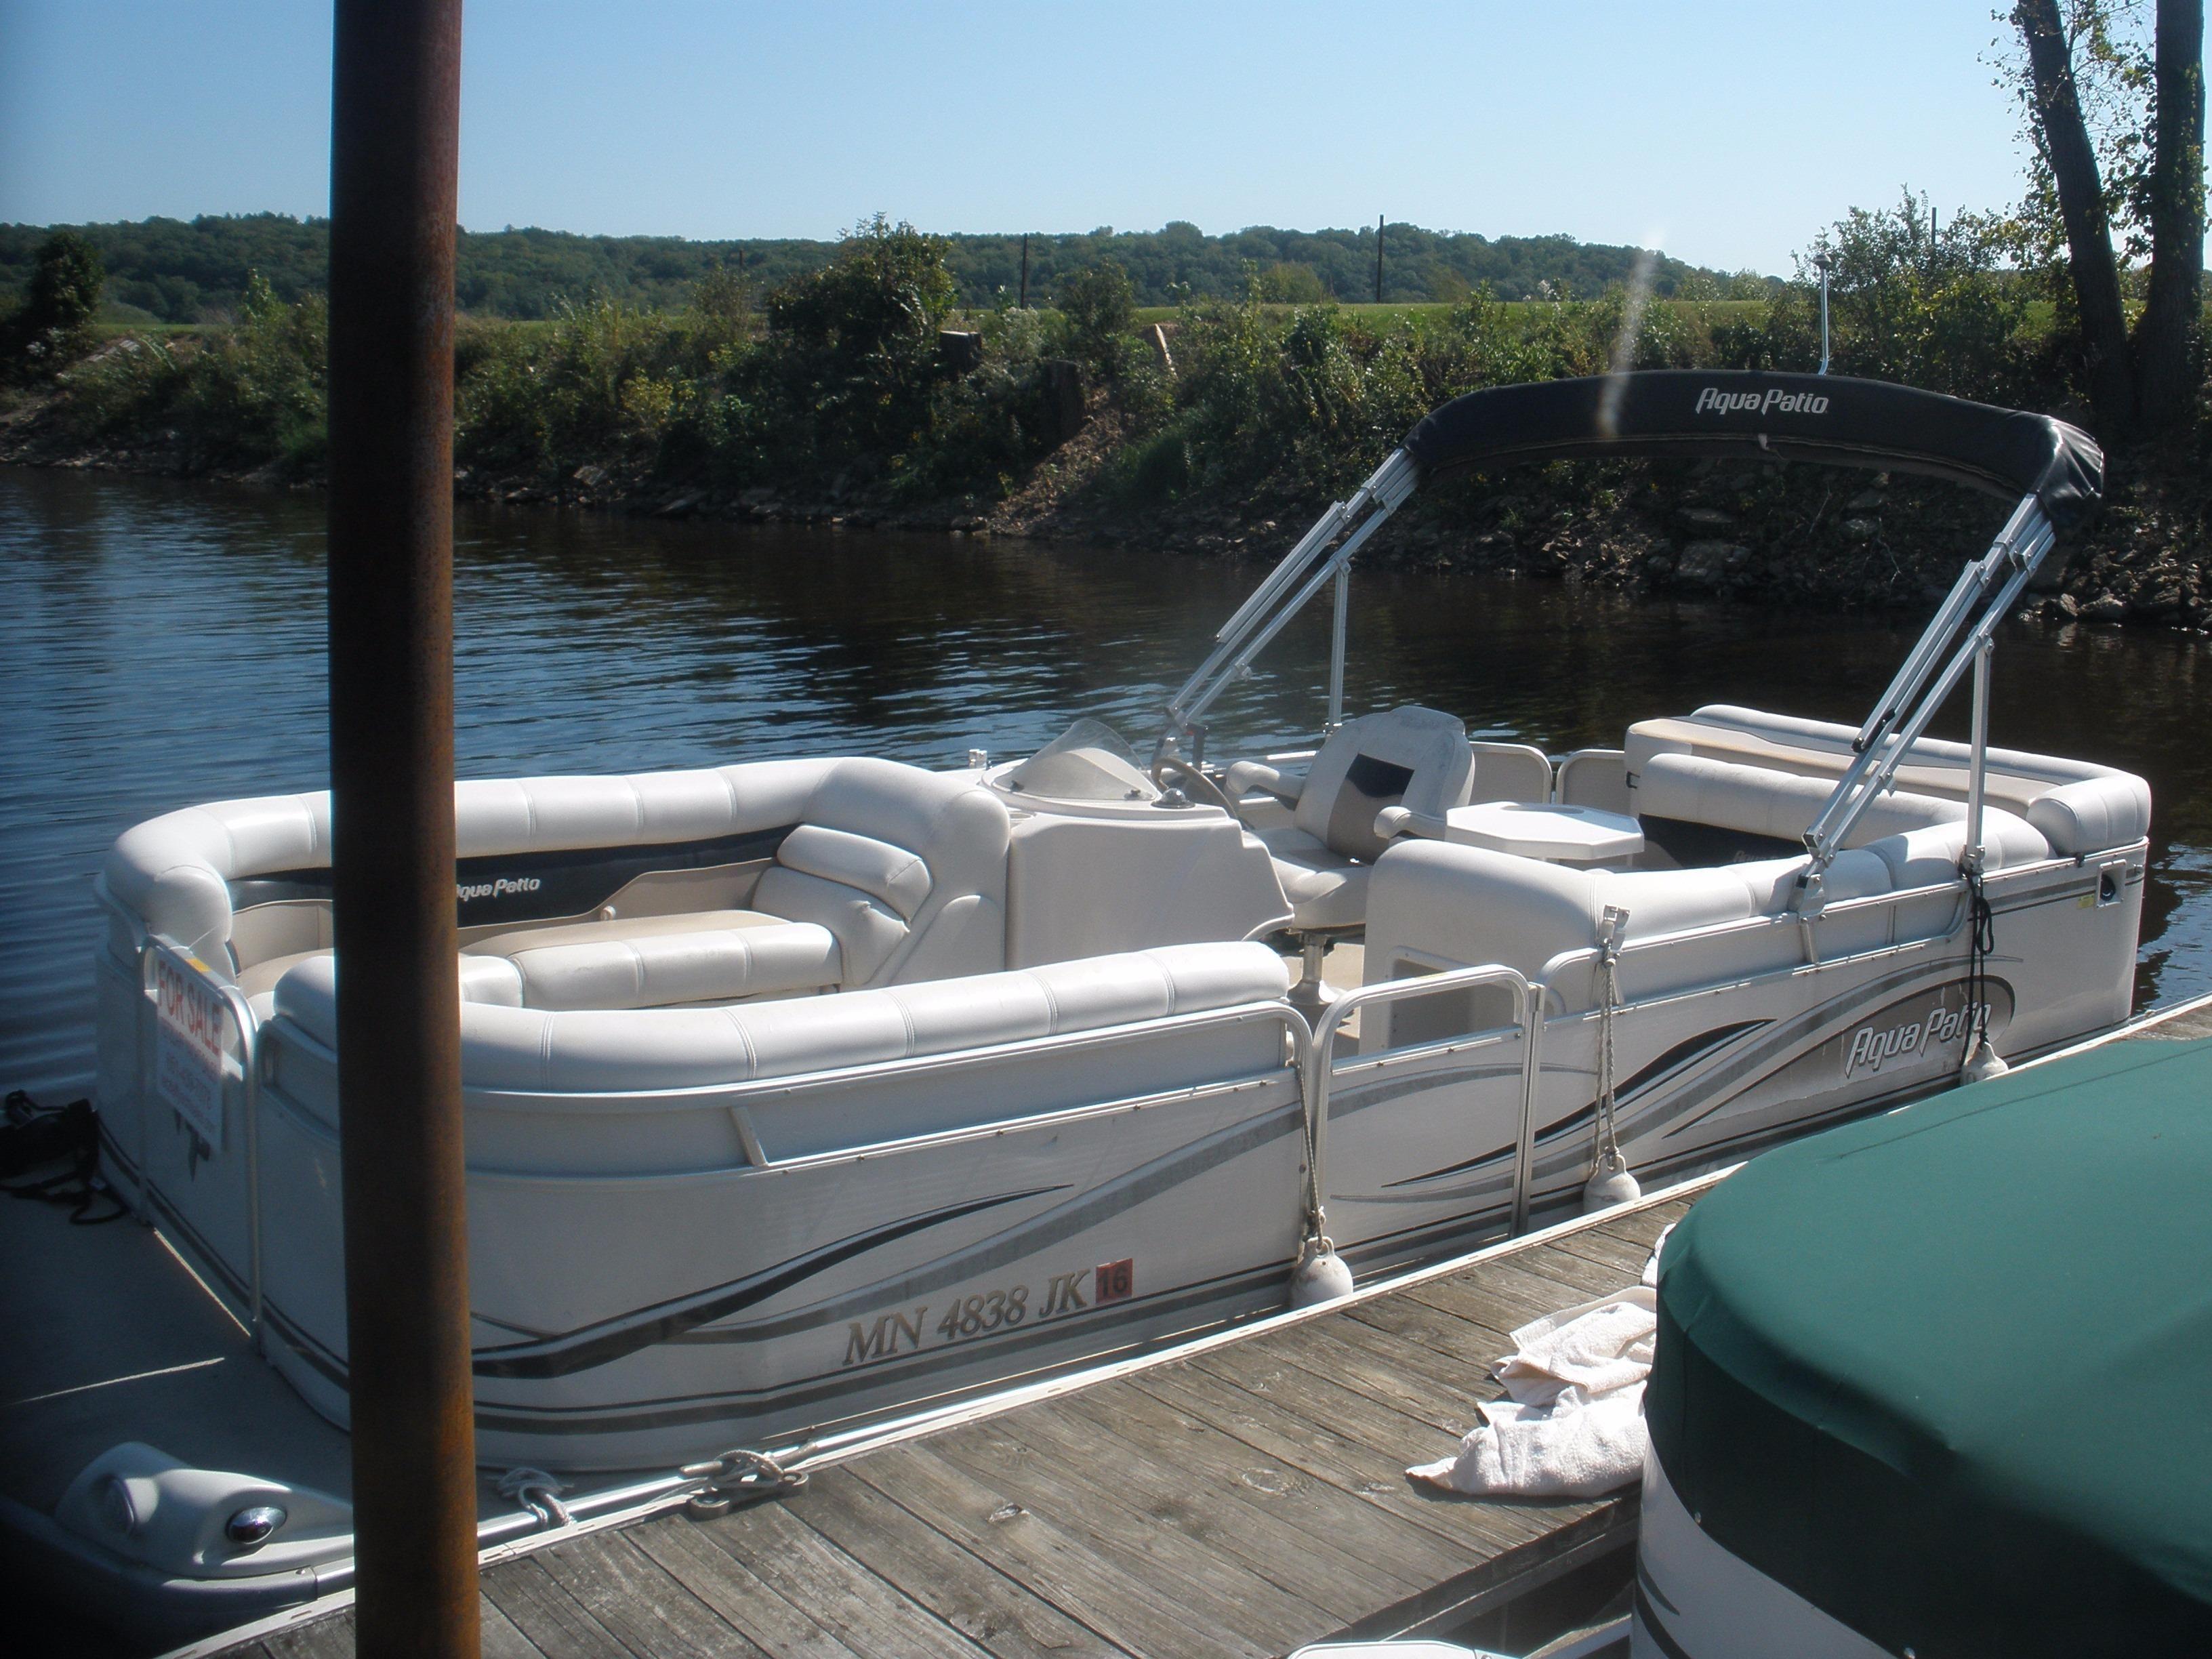 2002 Godfrey Aqua Patio Pontoon Power Boat For Sale